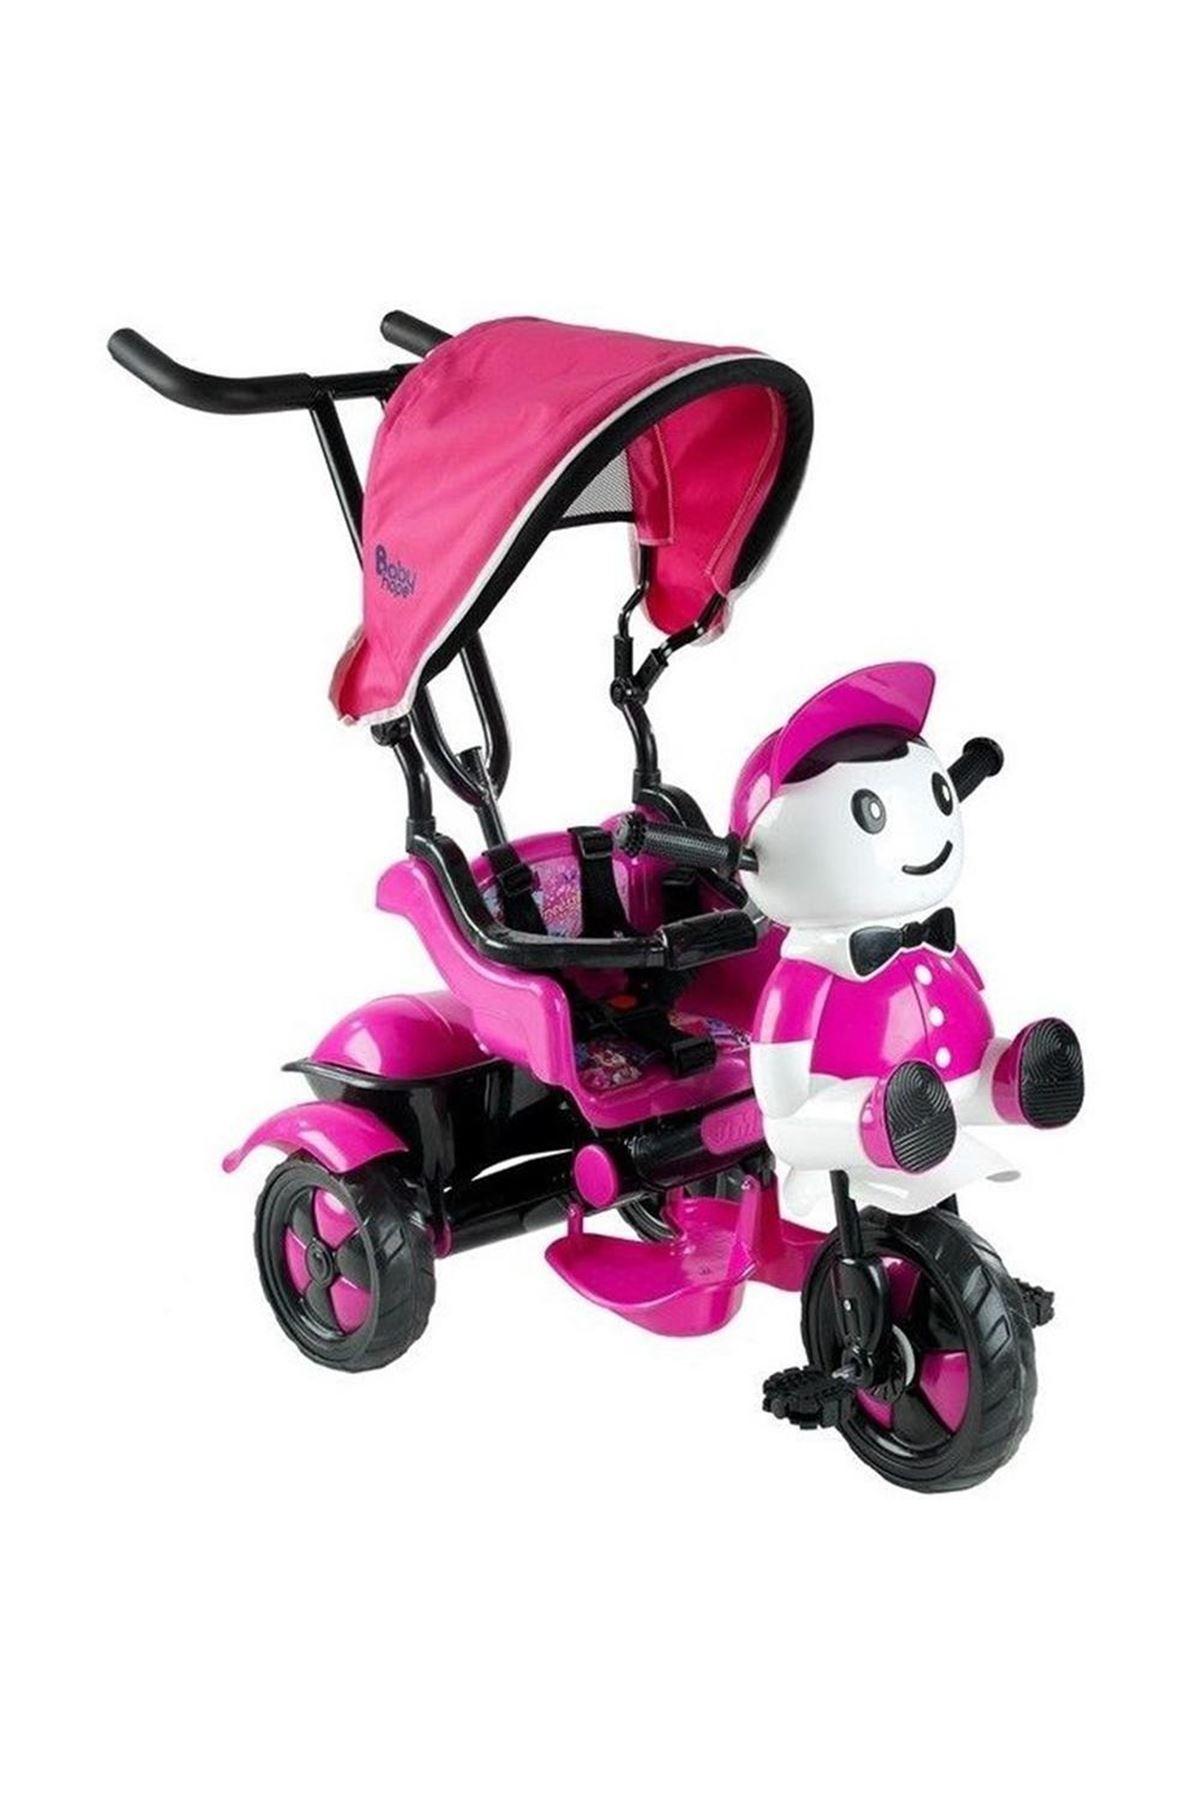 Babyhope 125 Yupi Triycle 3 Tekerli Kontrollü Bisiklet Pembe